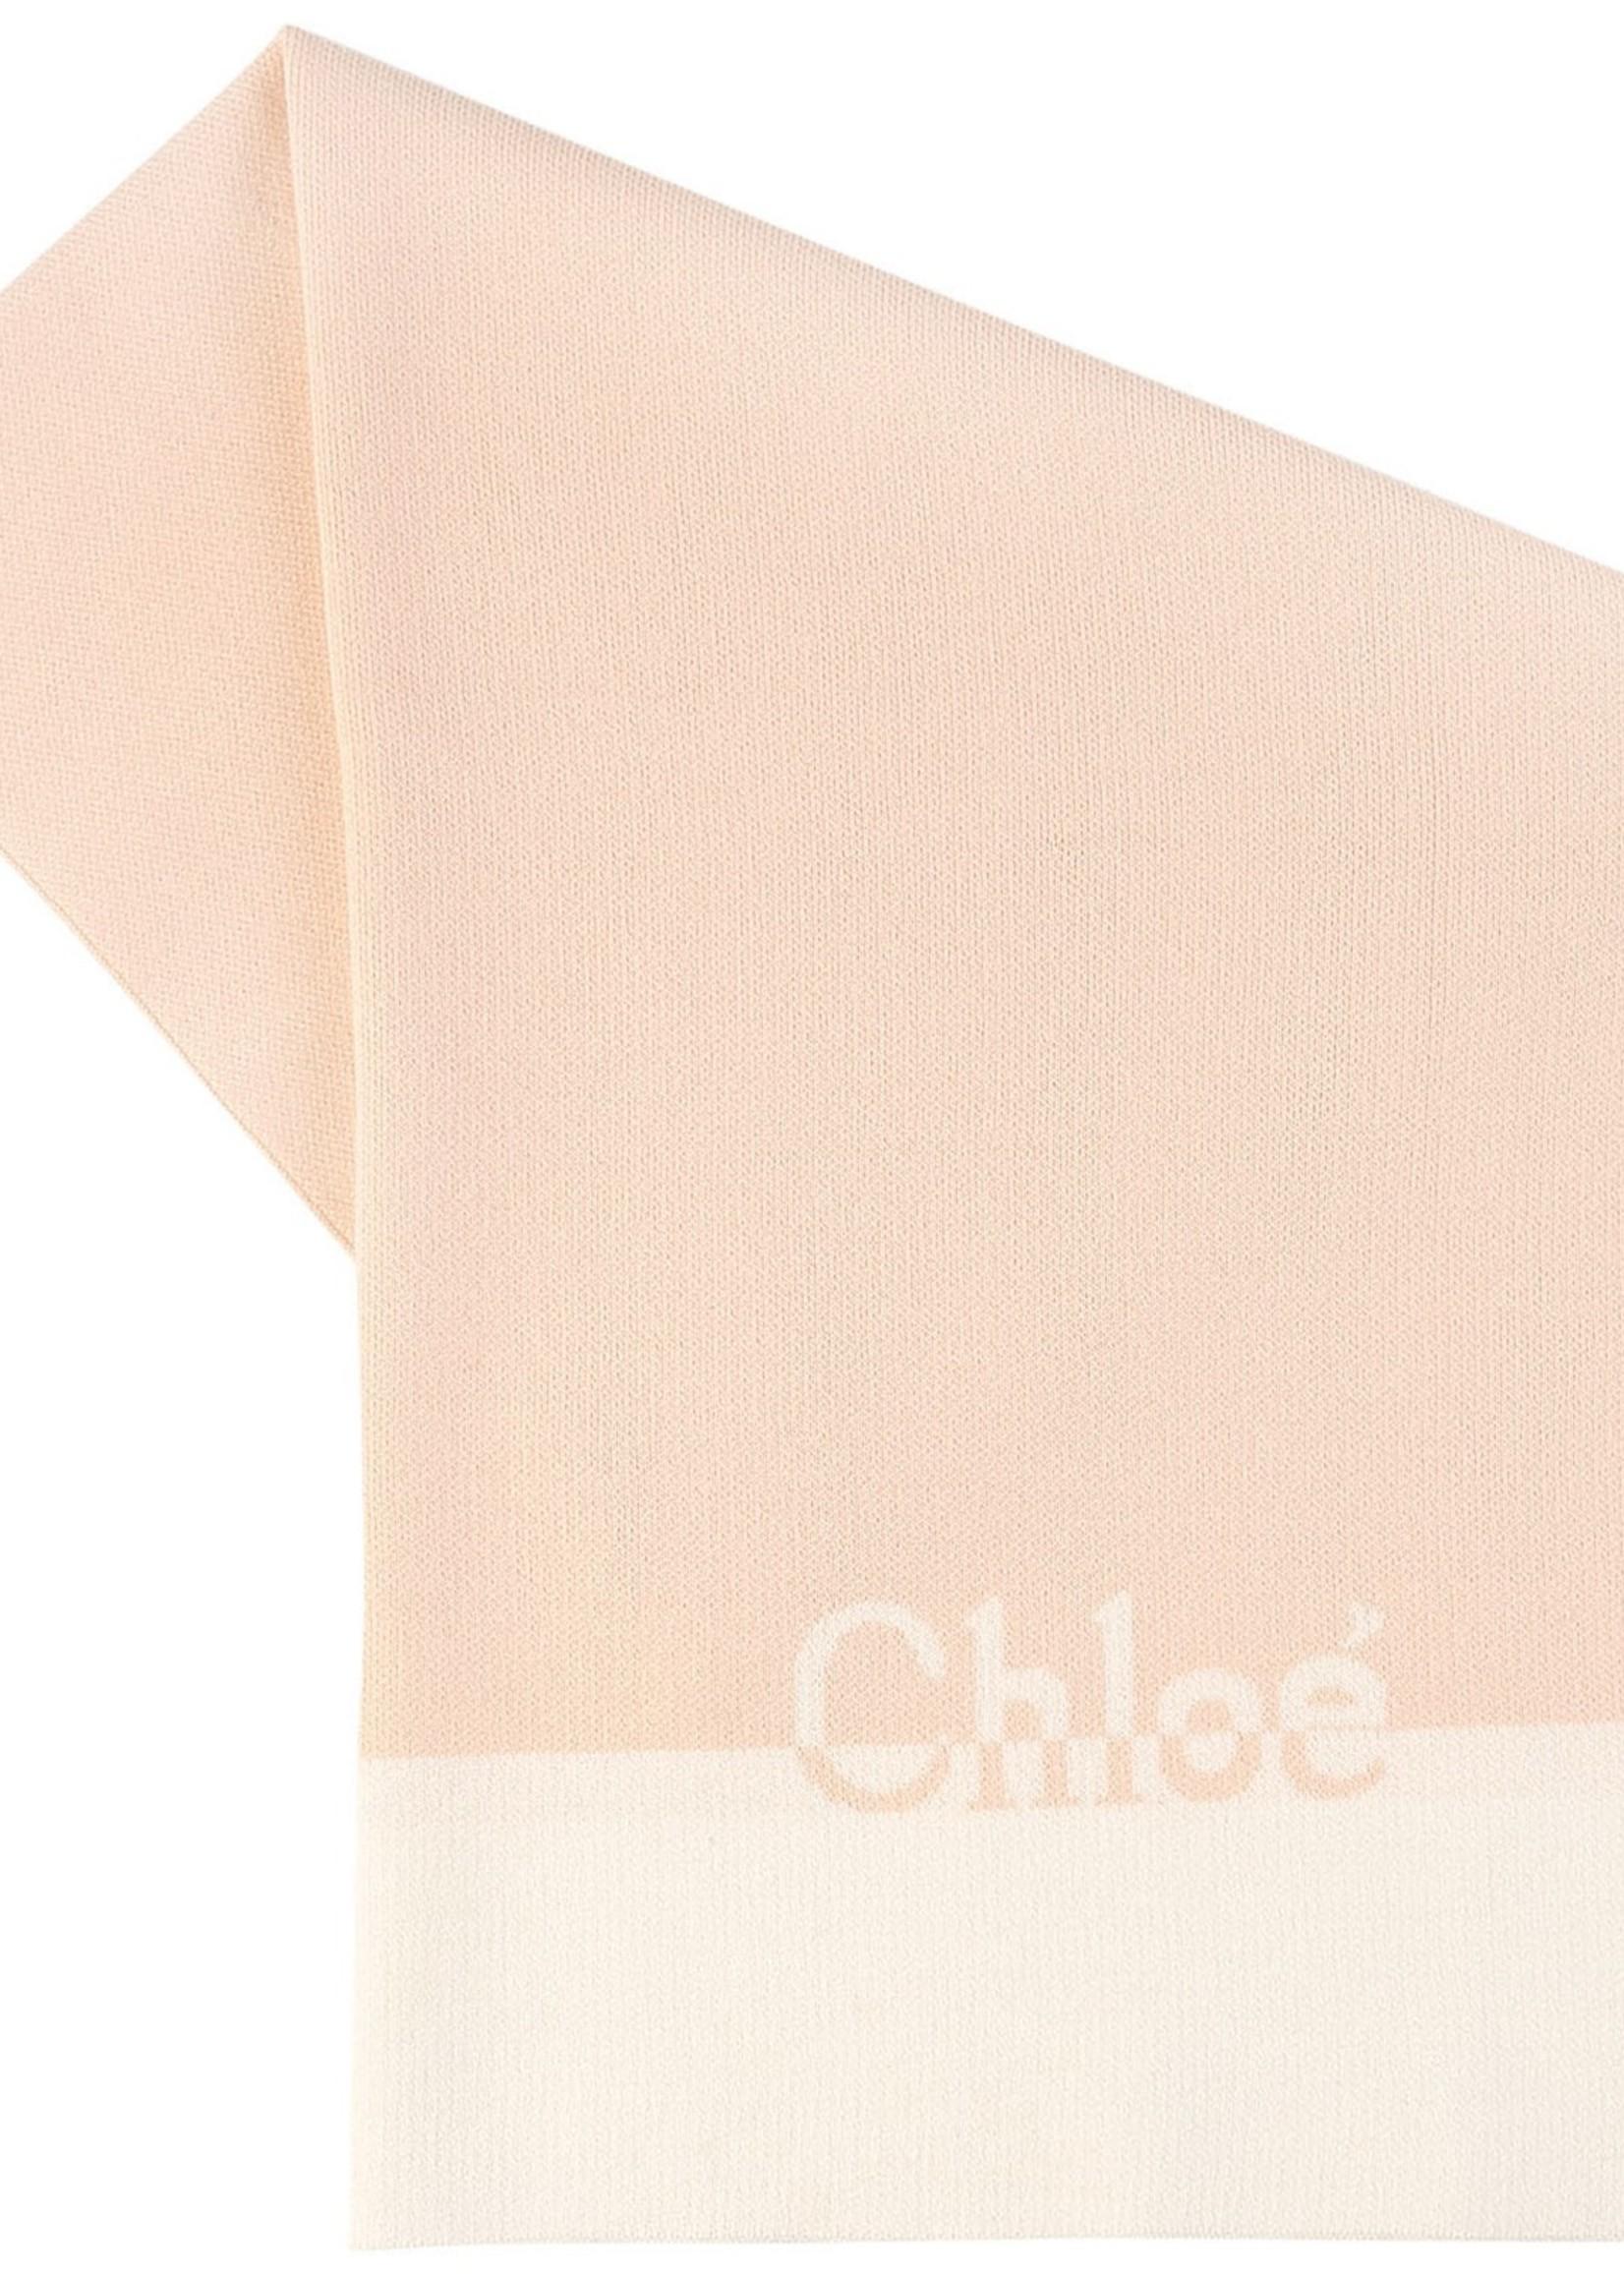 Chloe Chloe-AW21 C11194 ECHARPE